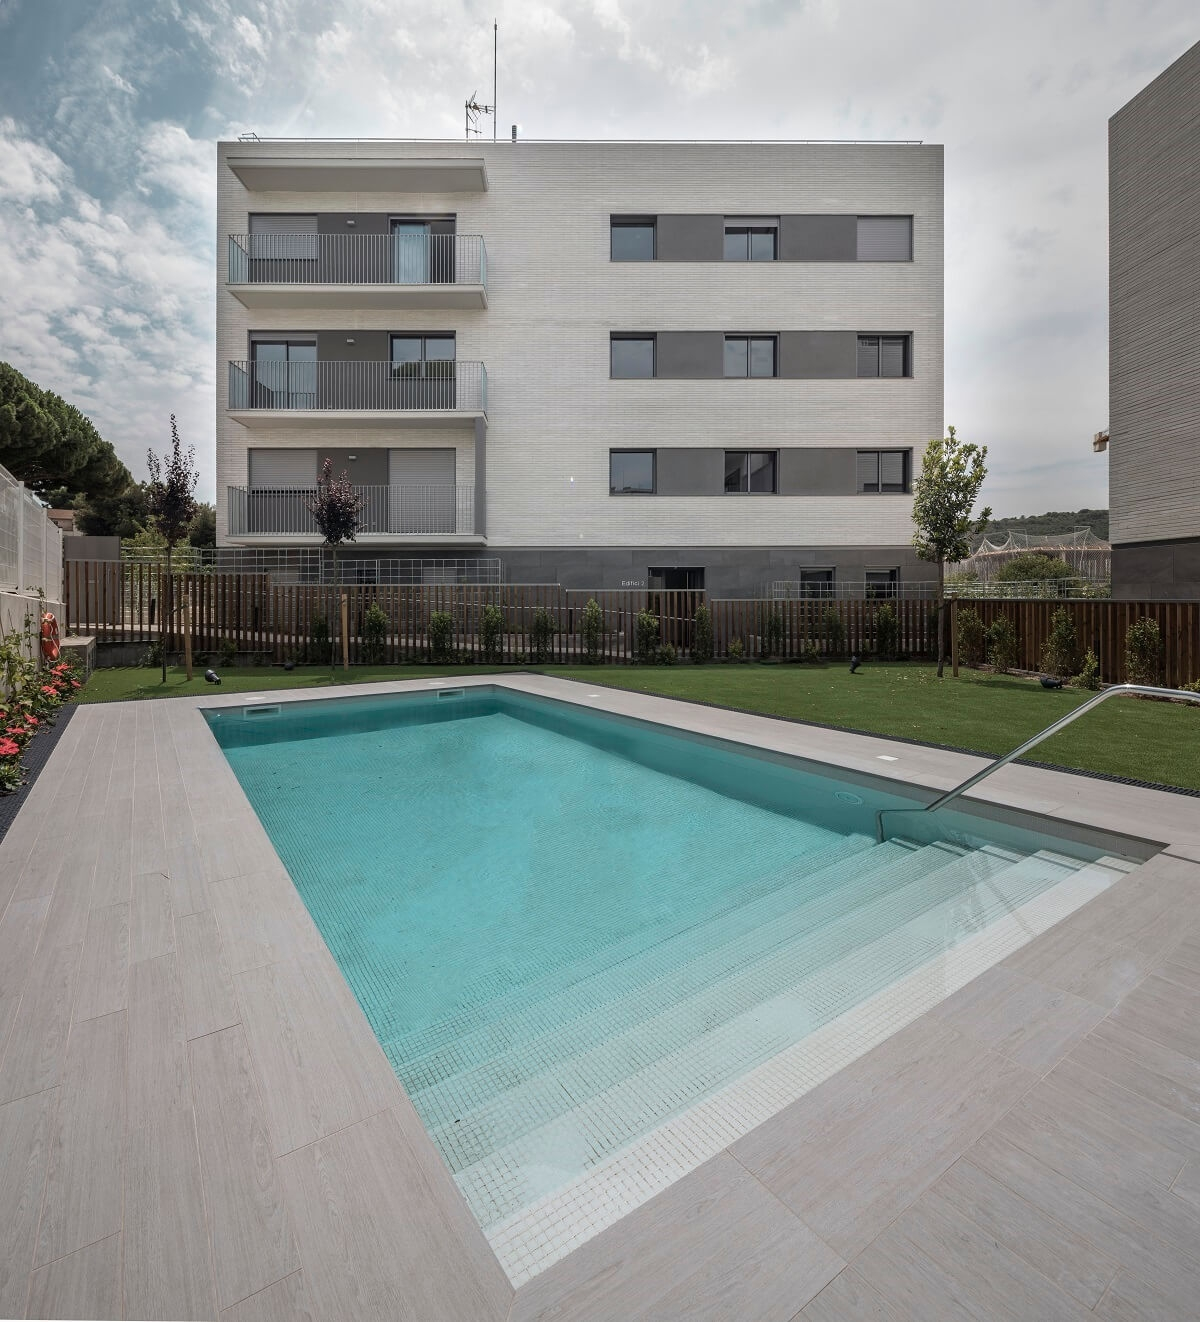 exteriores con piscina - OM de Tiana Quorania